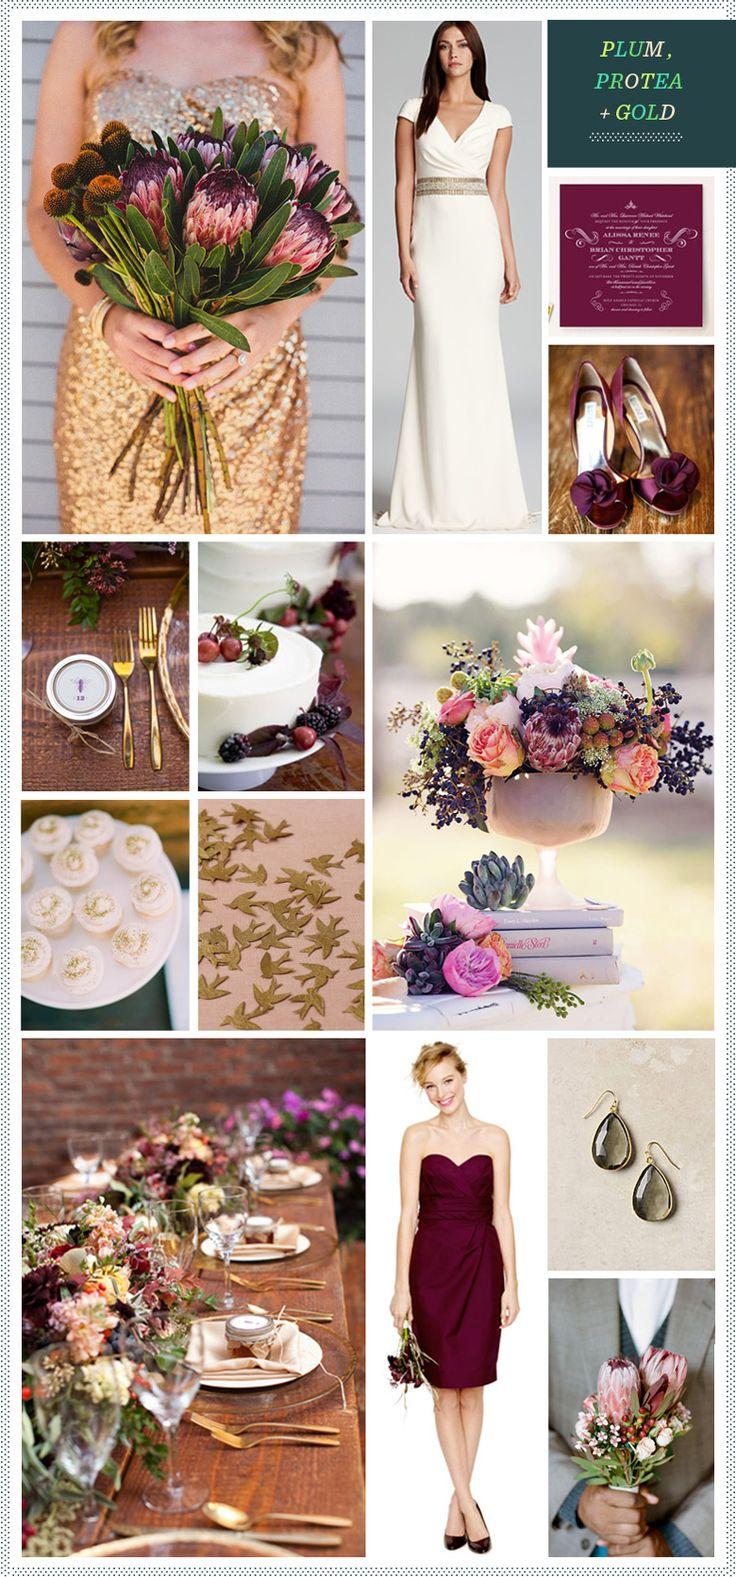 REVEL: Plum, Protea + Gold Wedding Inspiration